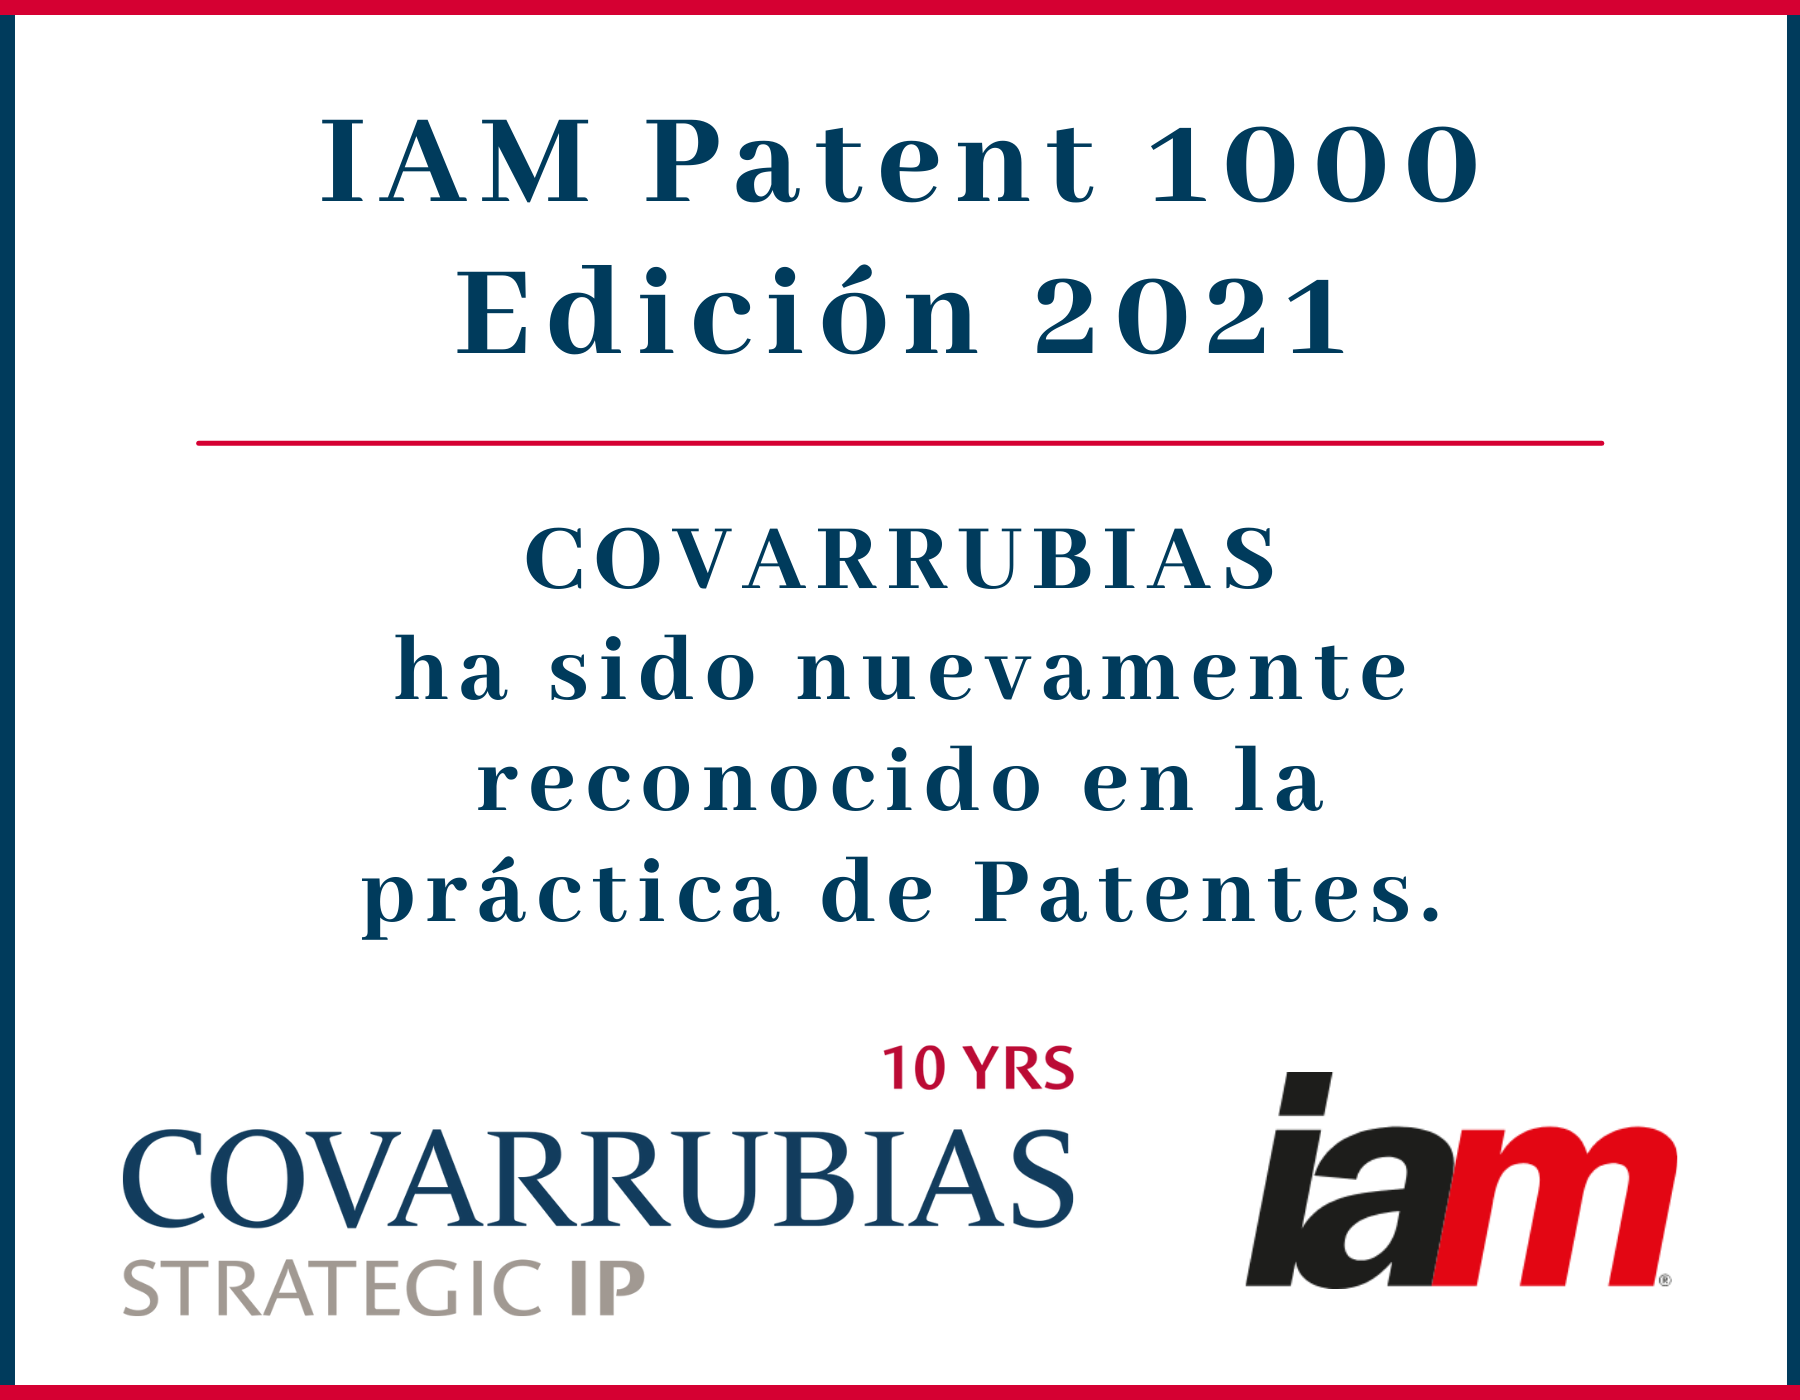 Covarrubias ha sido destacada en patentes por IAM Patent 1000